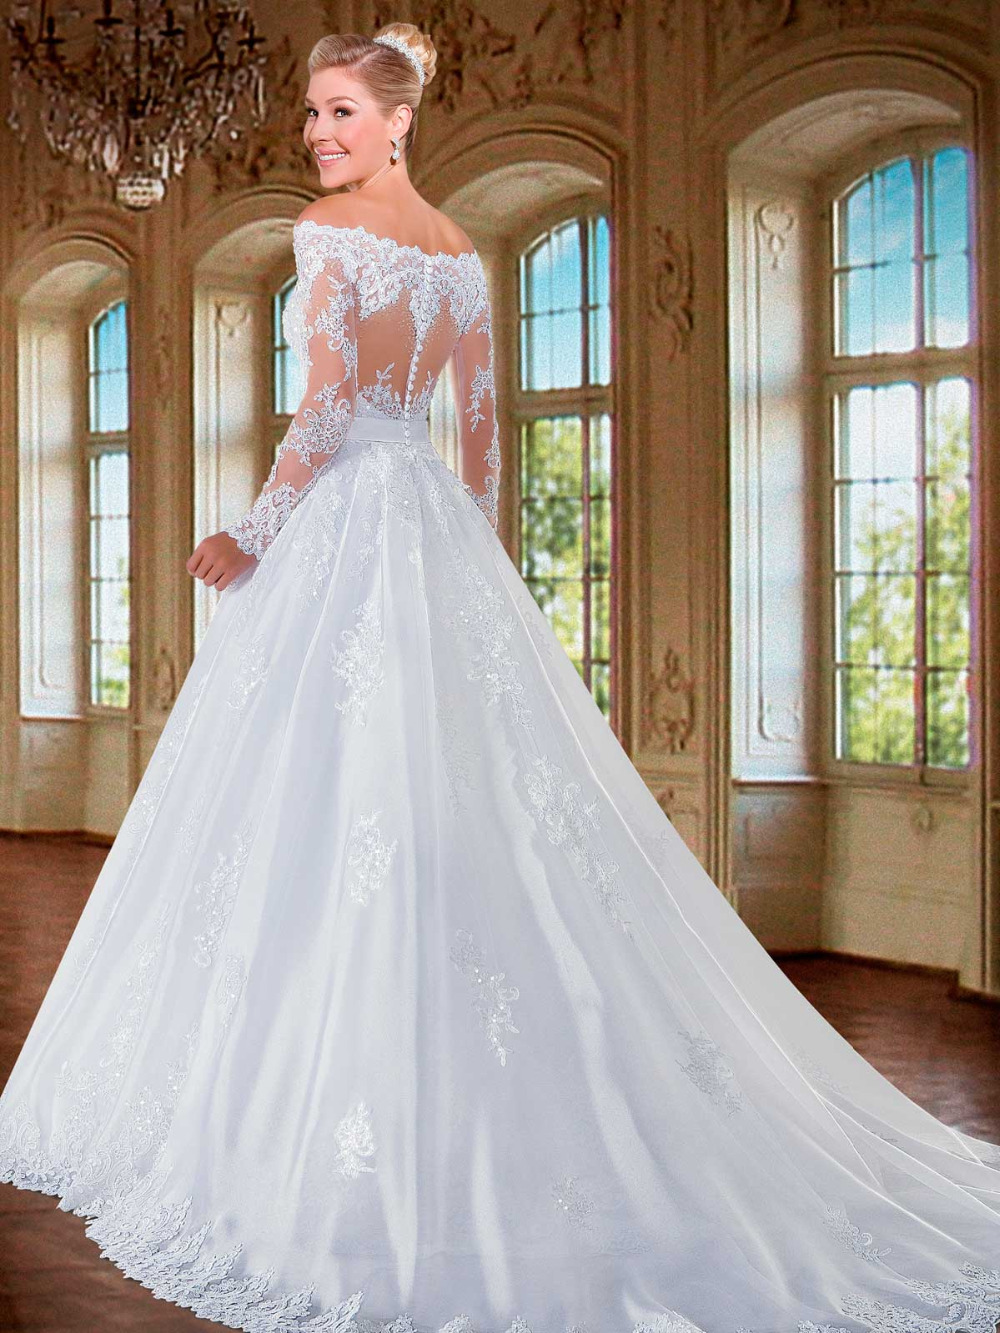 Aliexpress.com : Buy Vnaix W3016 Long Sleeves Ball Gown Lace ...